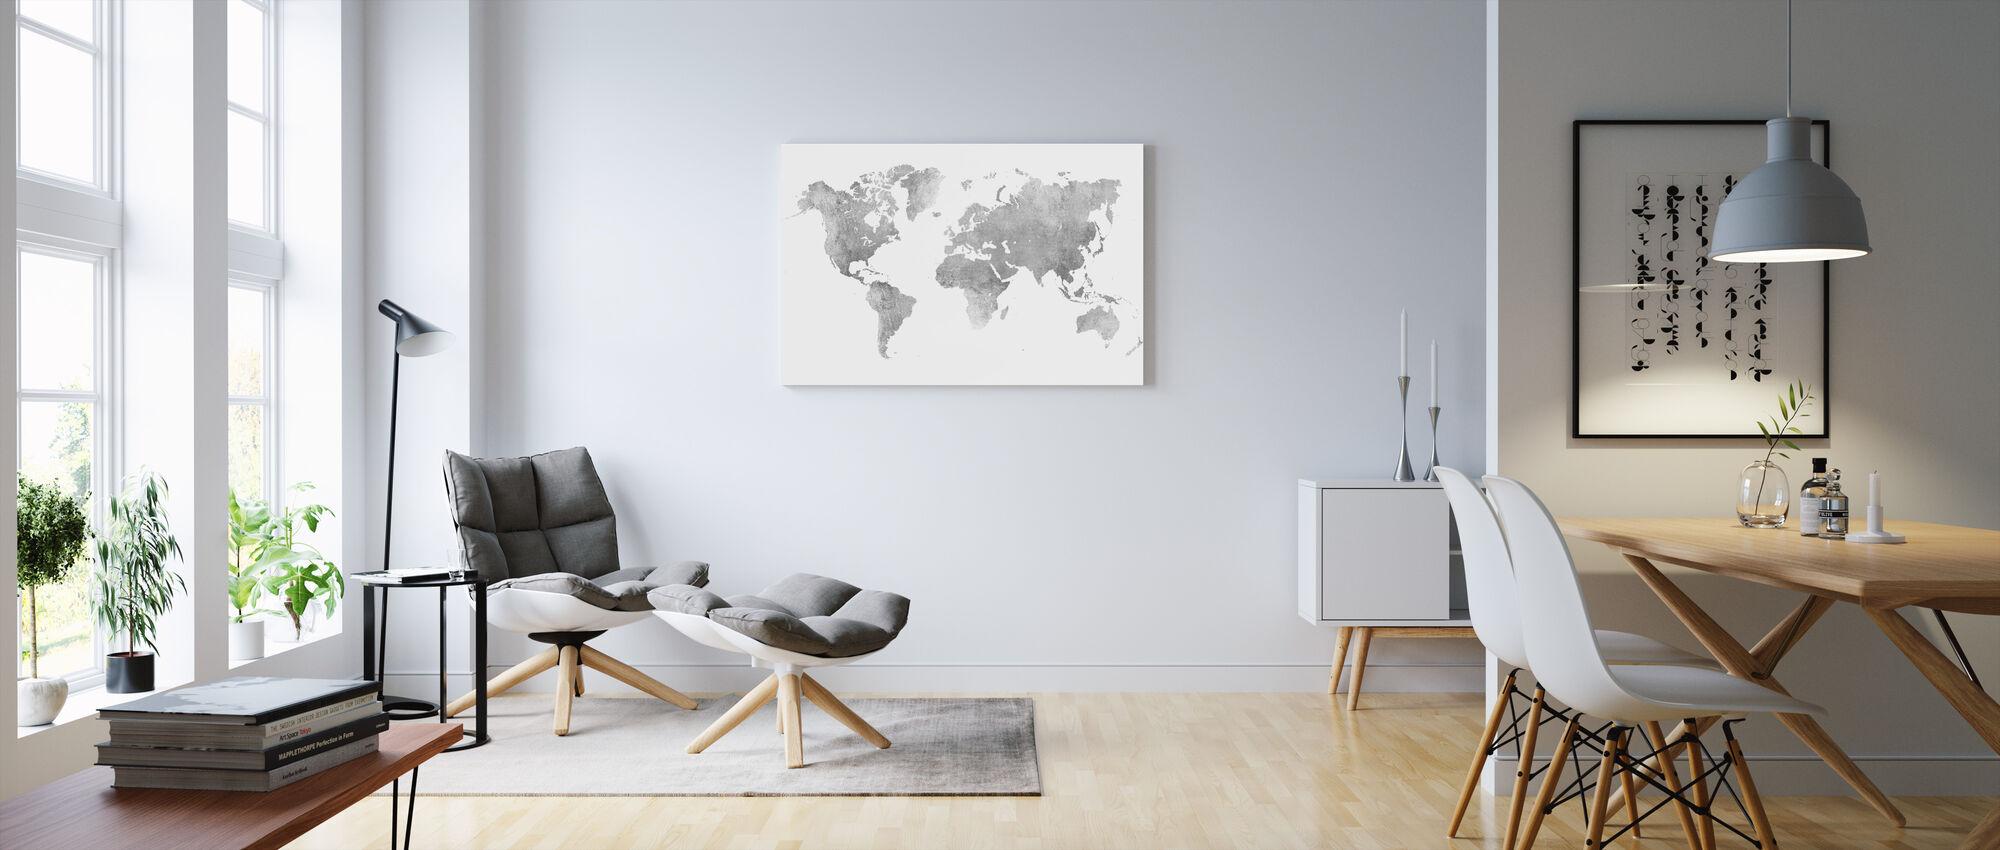 World Map Brushed Metal II - Canvas print - Living Room